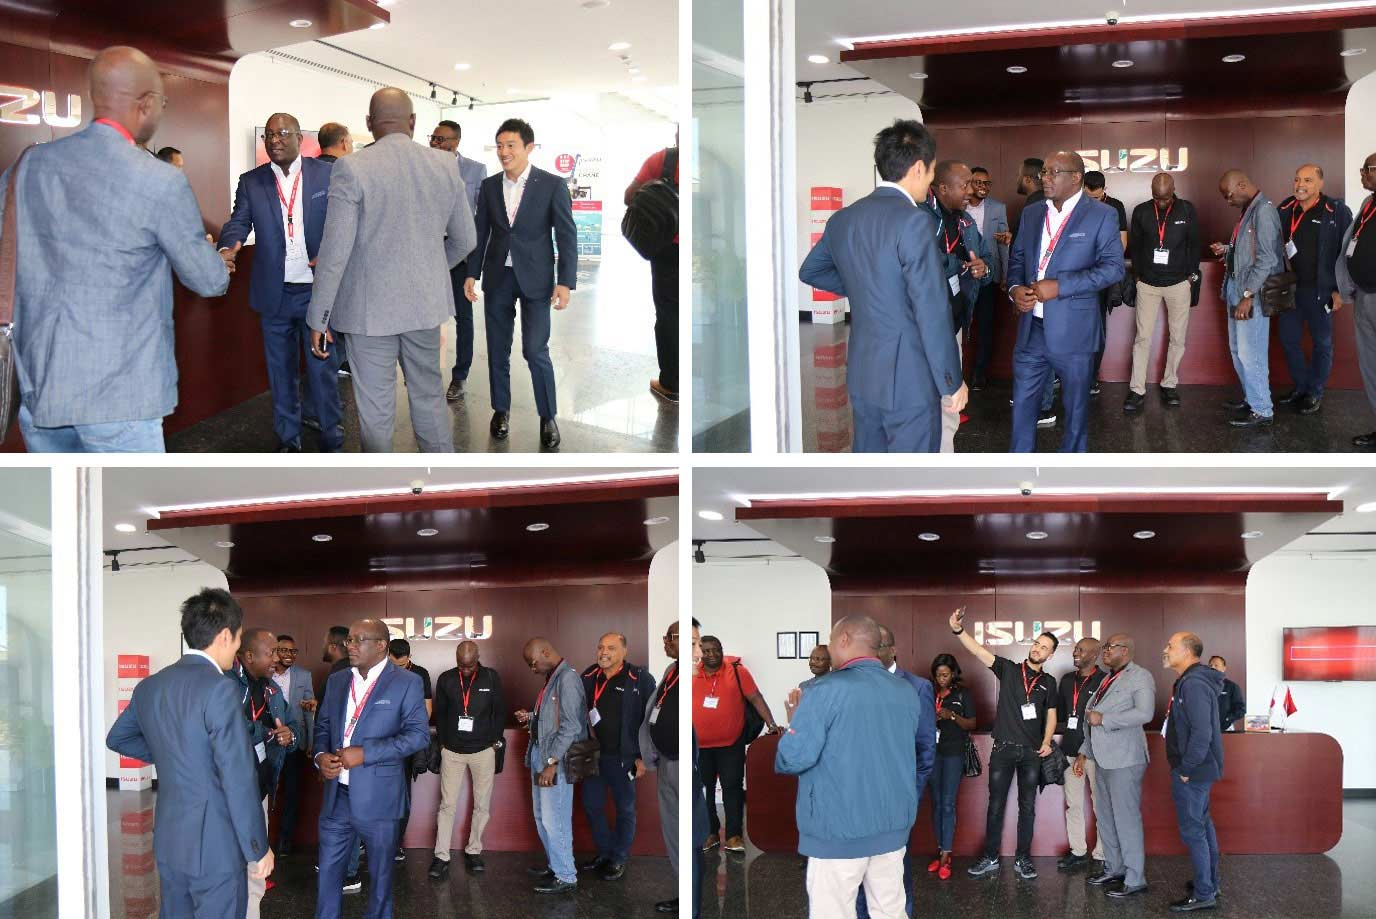 Isuzu Sales Challenge Winners being welcomed to Isuzu Motors International Office